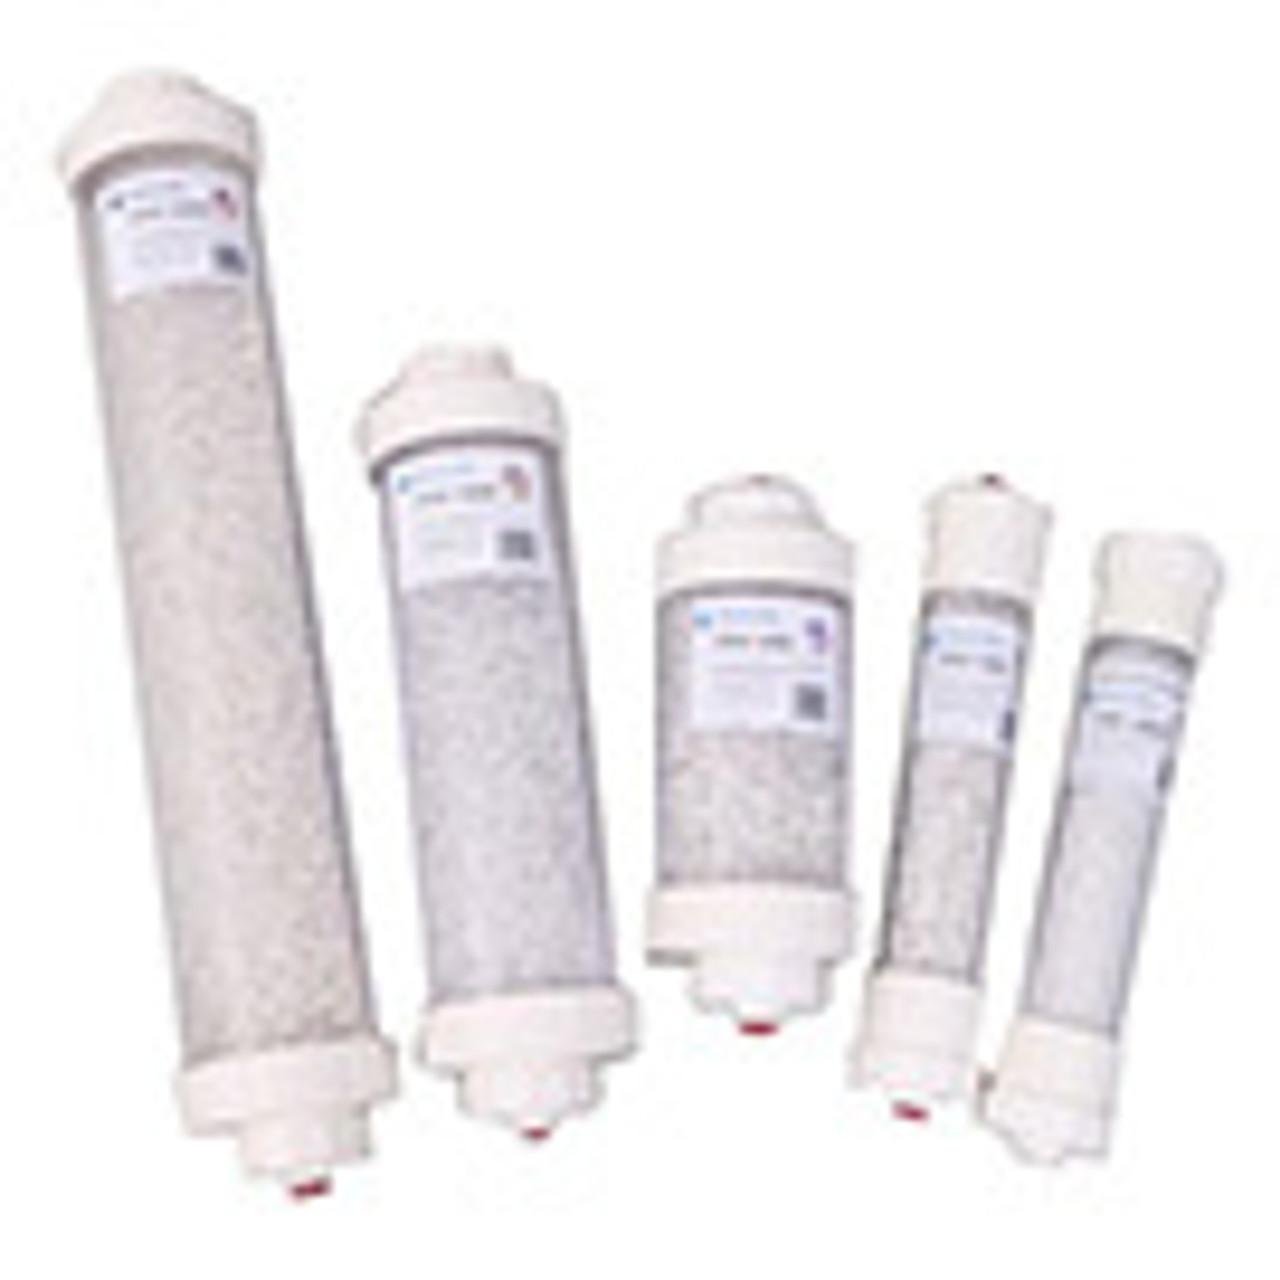 Condensate Neutralizers